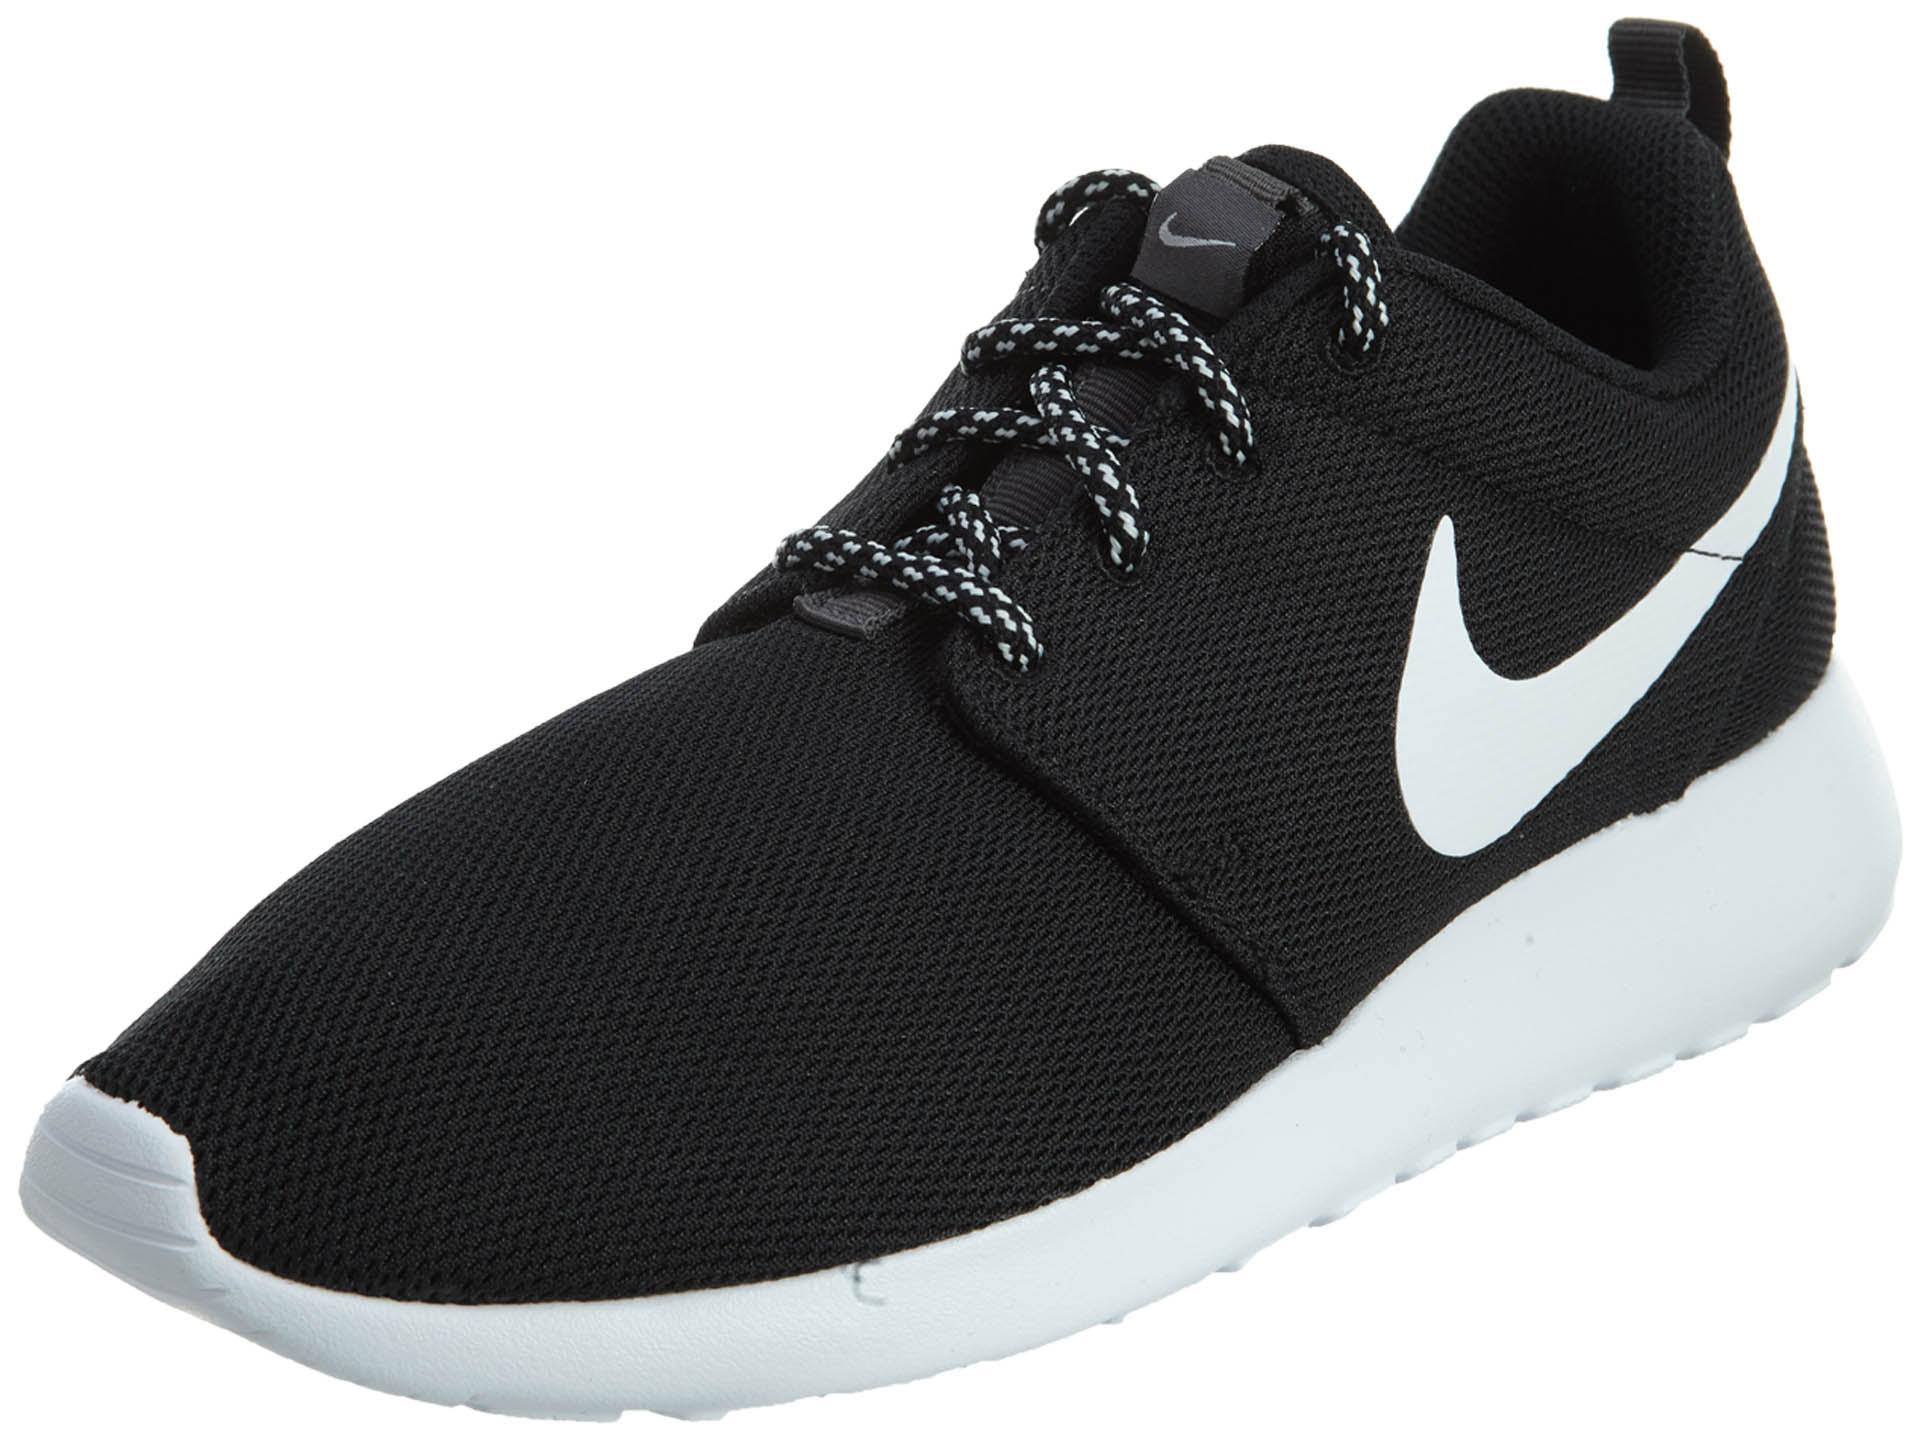 Roshe gris Blanco One De 8 Negro Oscuro Zapatos Nike 5 Tamaño 844994002 Mujer qAdxRPn6p